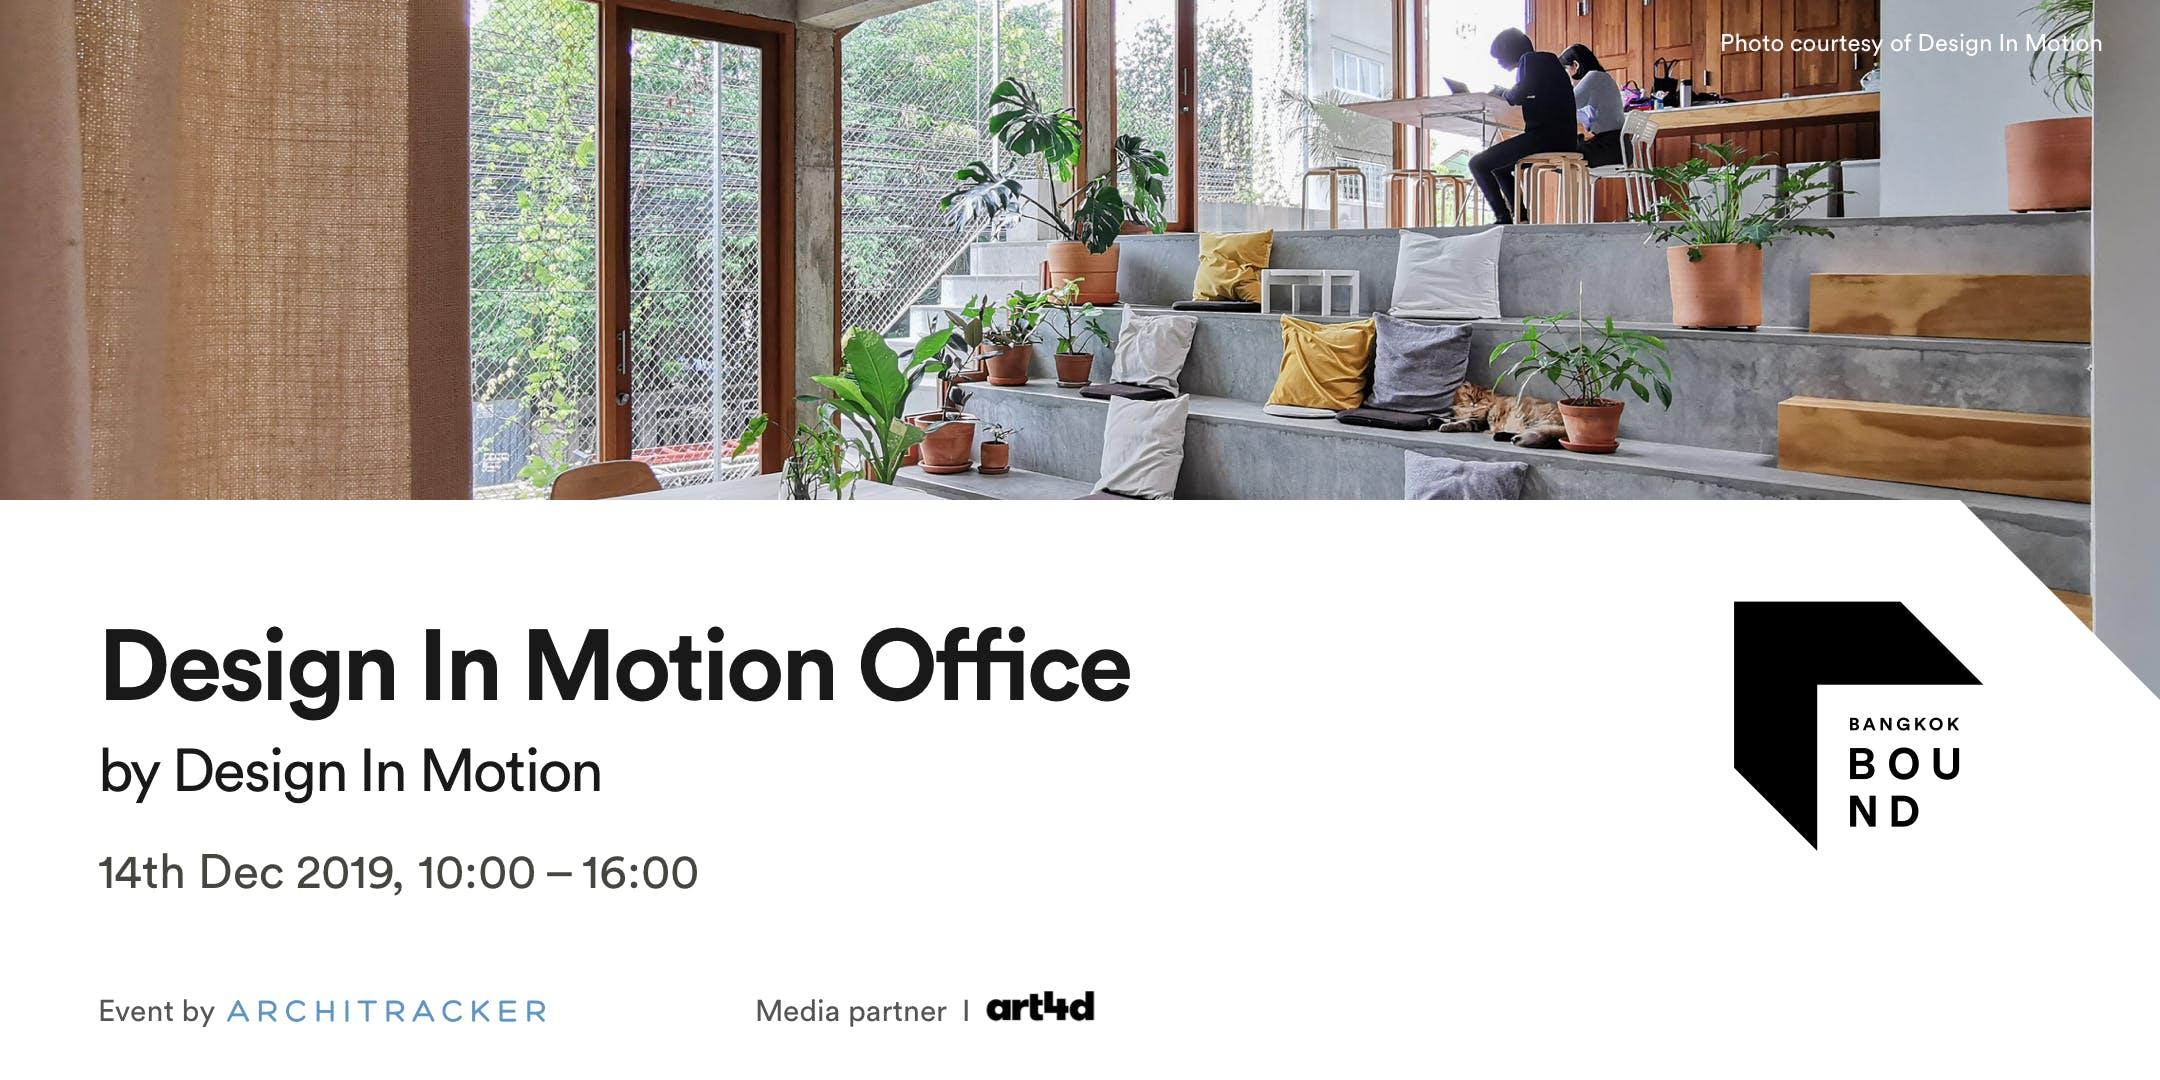 Bangkok Bound - Design In Motion Office